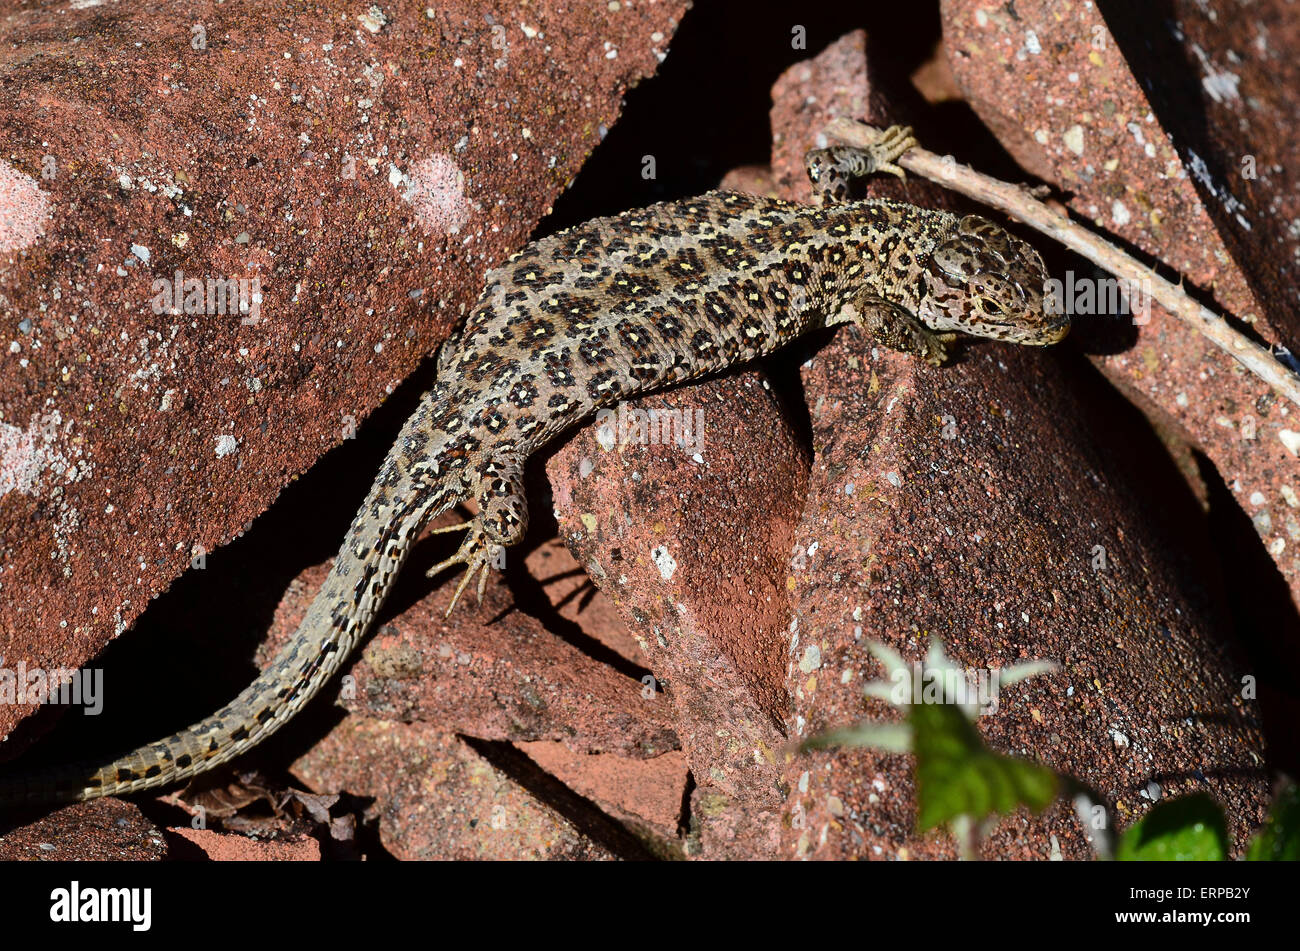 A sand lizard on some broken tiles Dorset UK - Stock Image